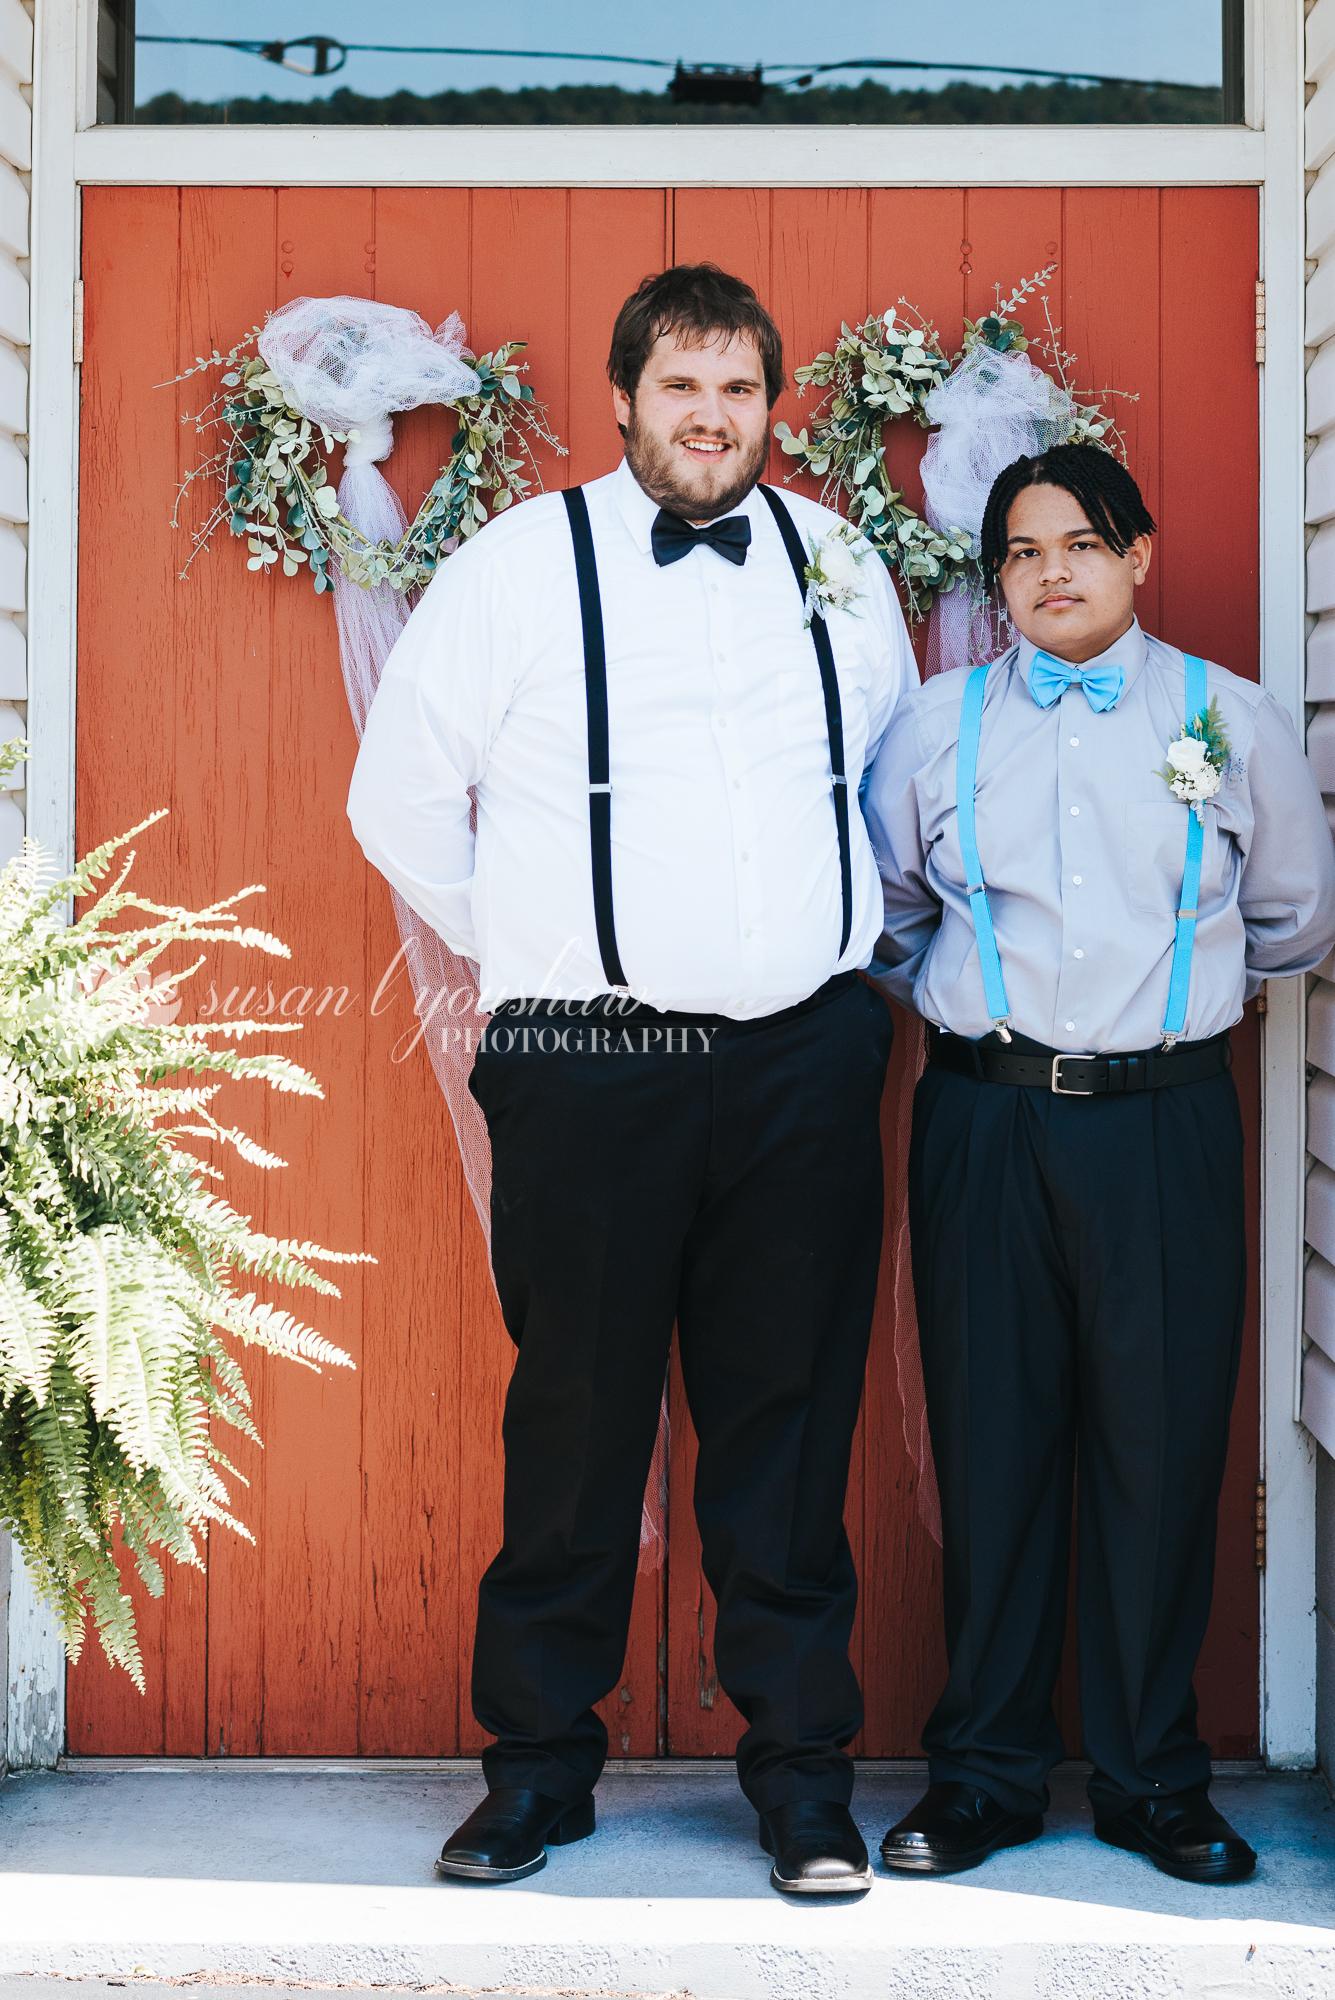 Katelyn and Wes Wedding Photos 07-13-2019 SLY Photography-24.jpg